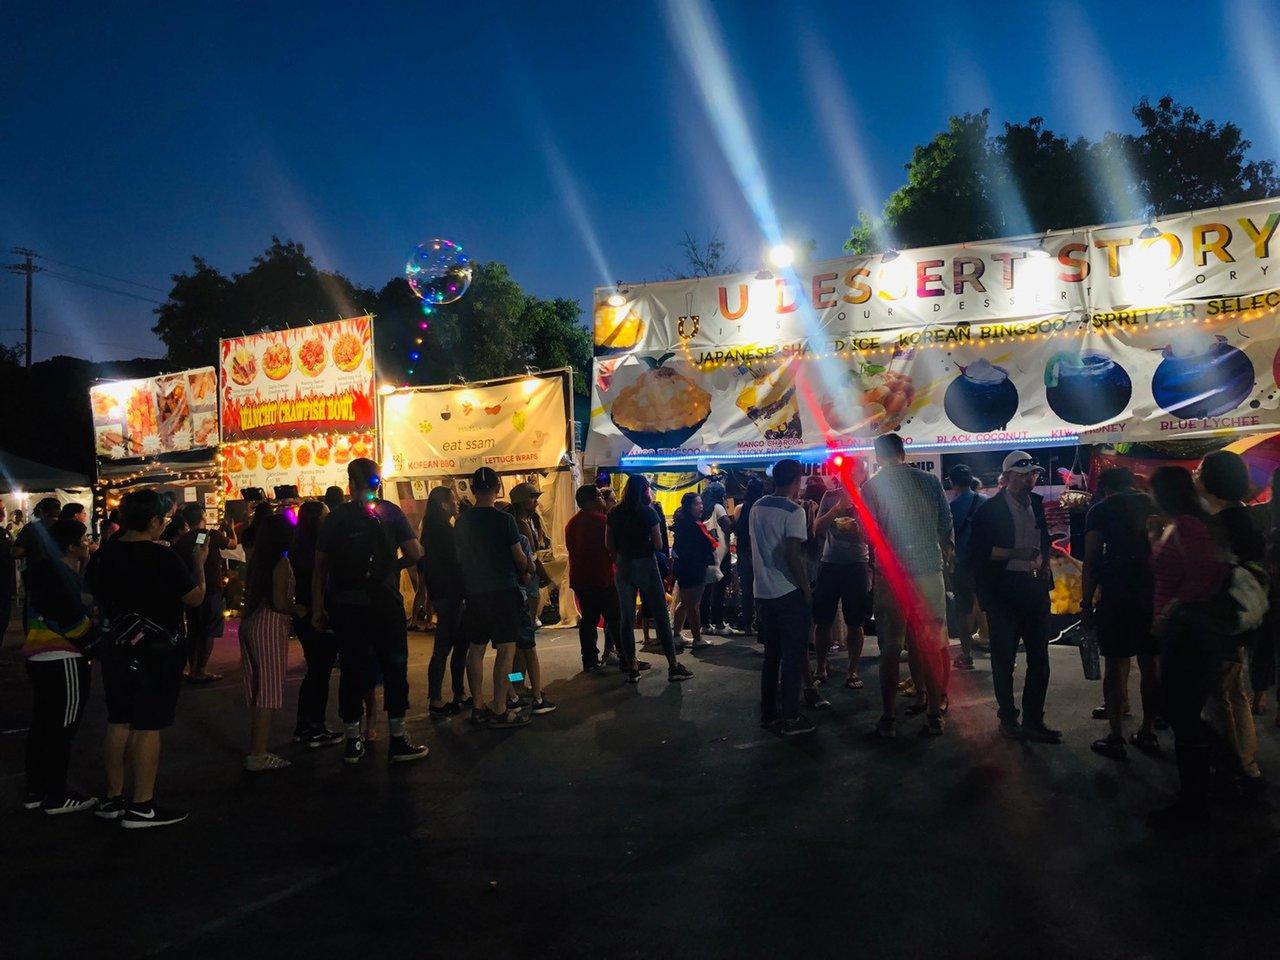 Norcal Night Market photo 1569272066784.jpg